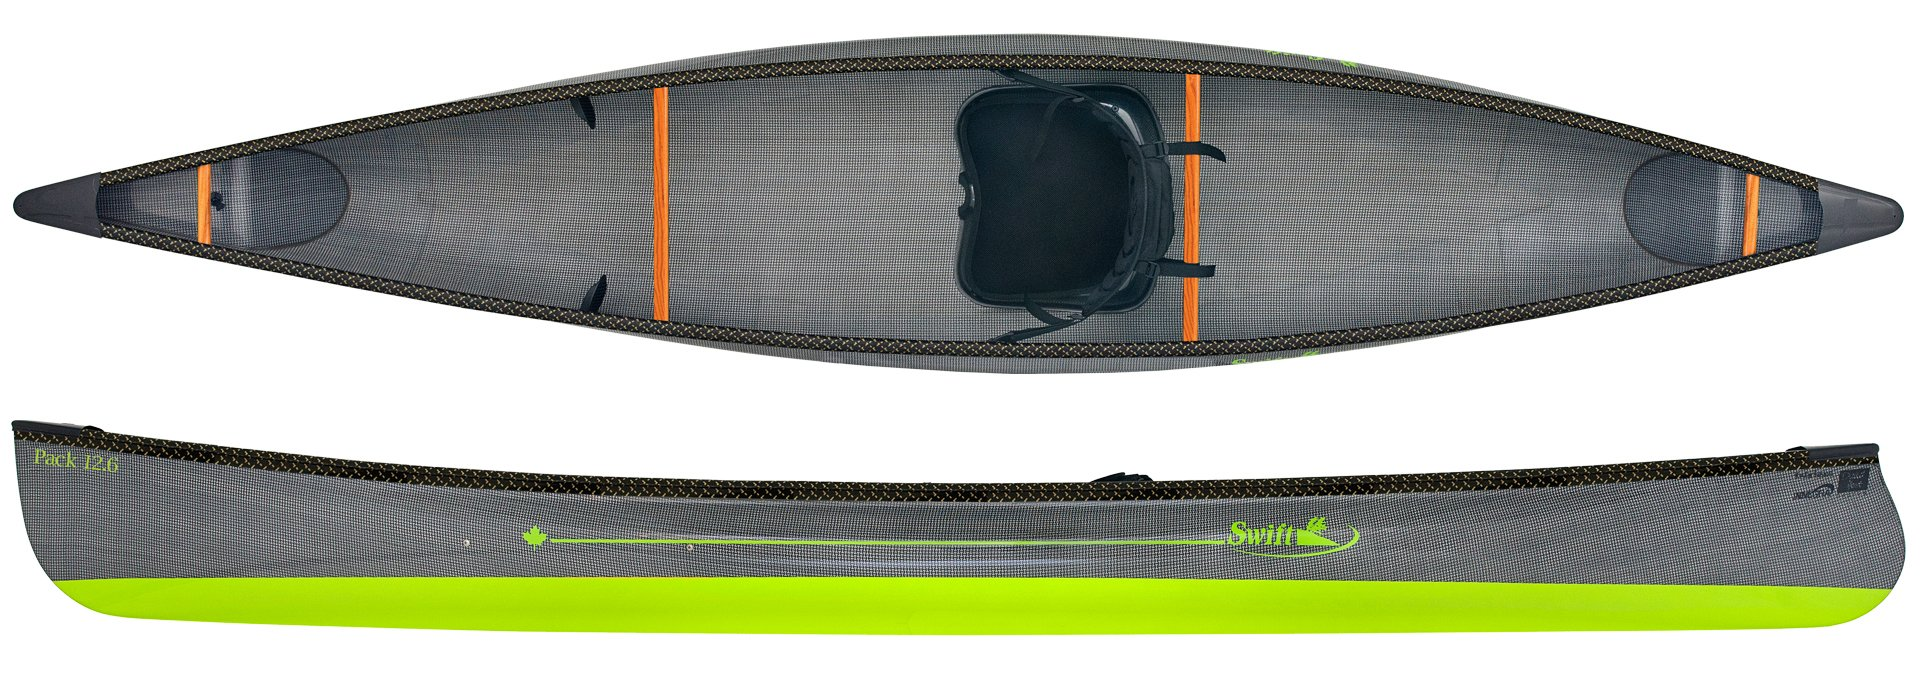 Swift Pack 12.6